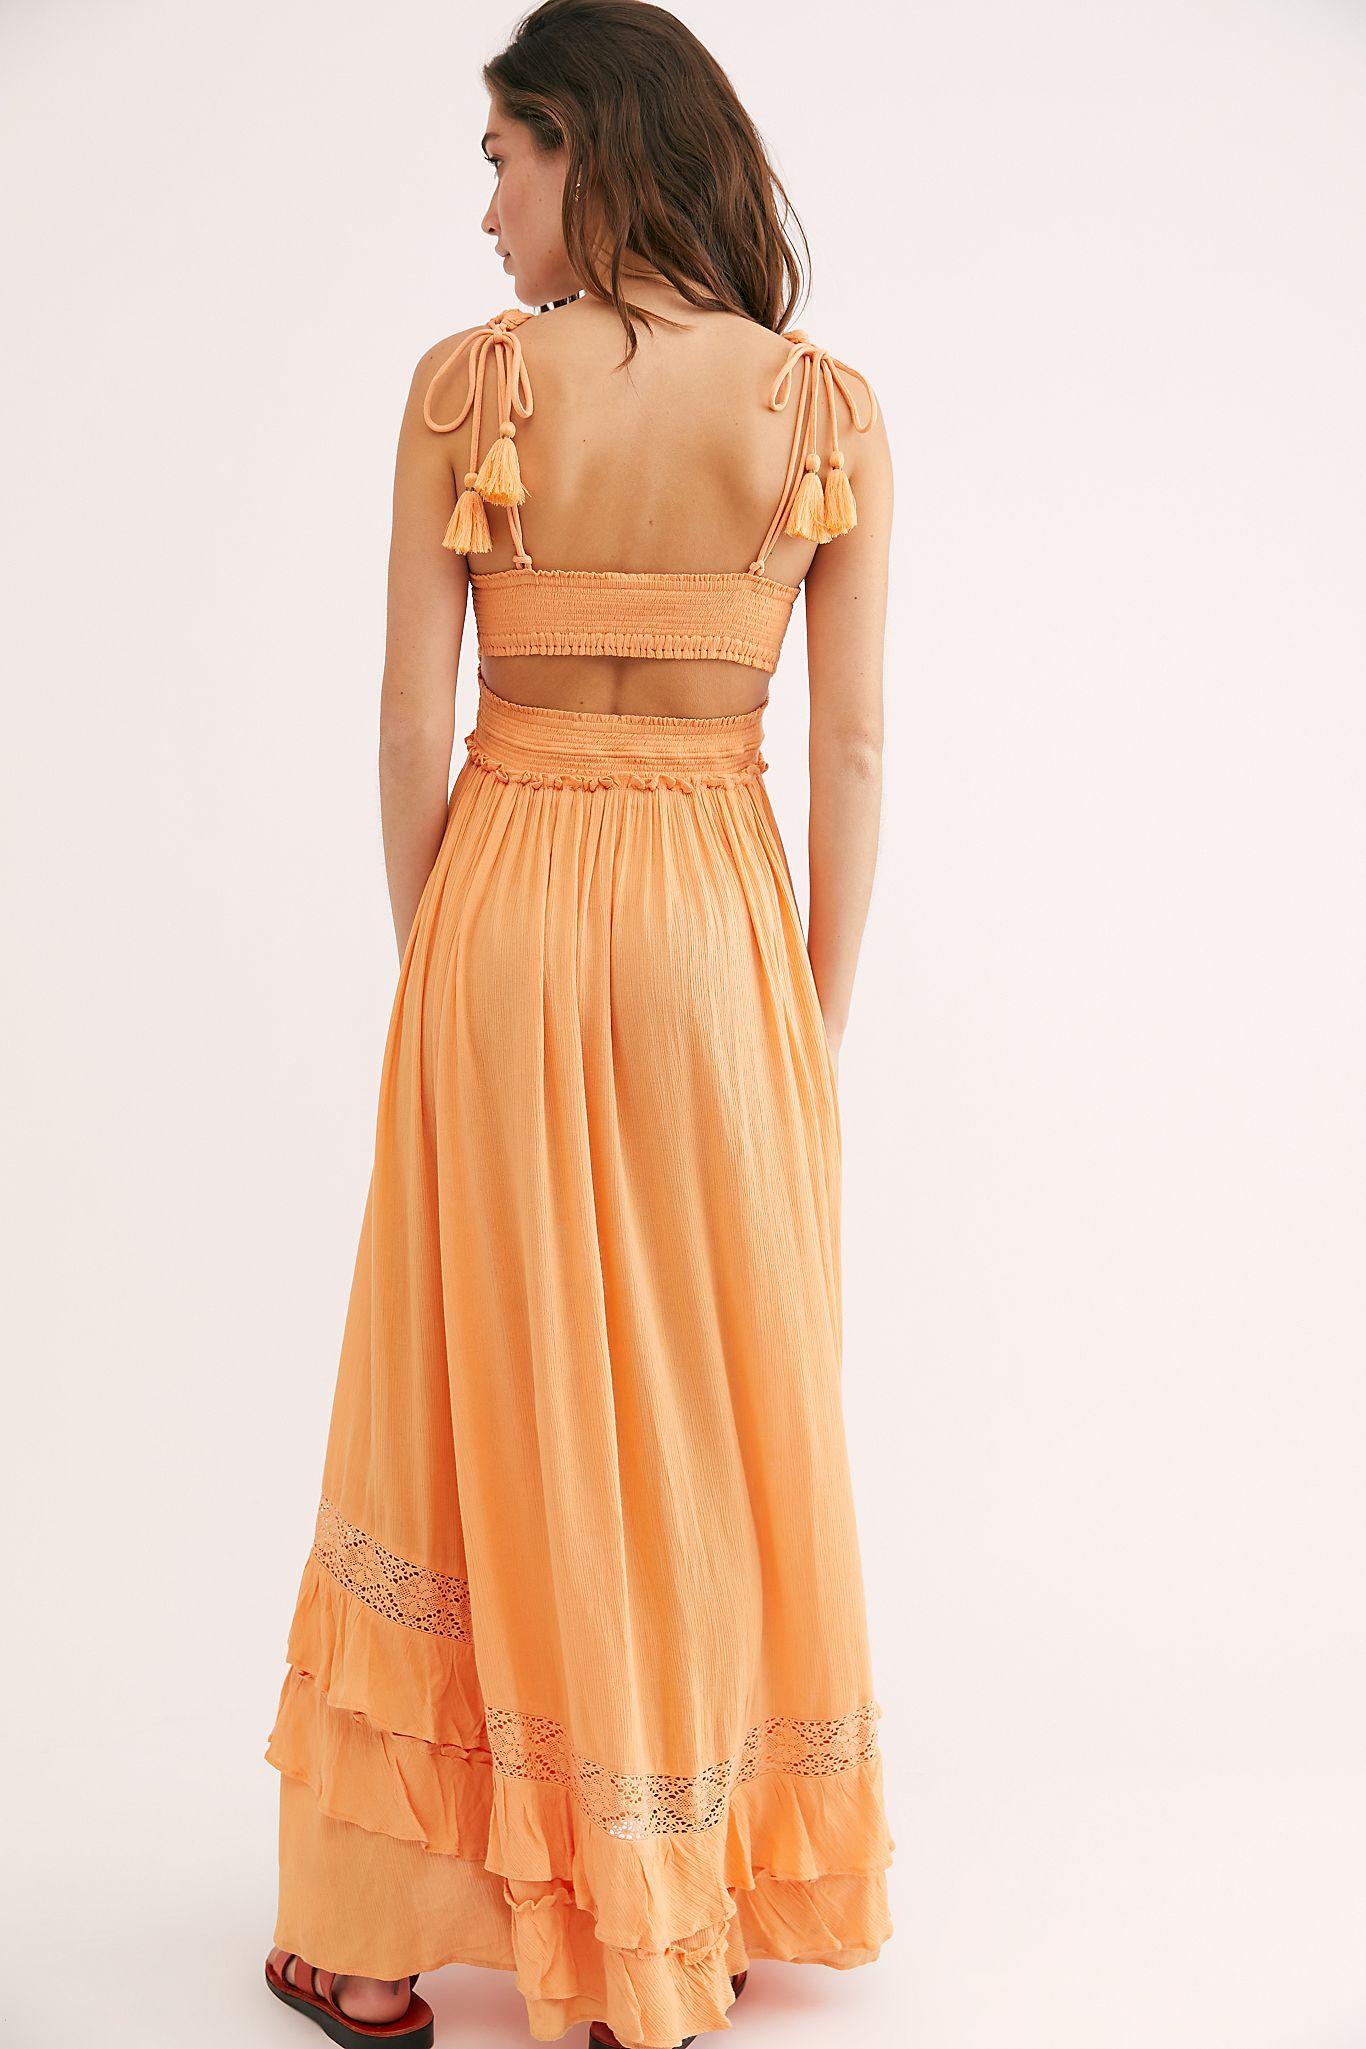 Santa Maria Maxi Dress Free People Maxi Dress Dresses Boho Chic Fashion [ 2049 x 1366 Pixel ]